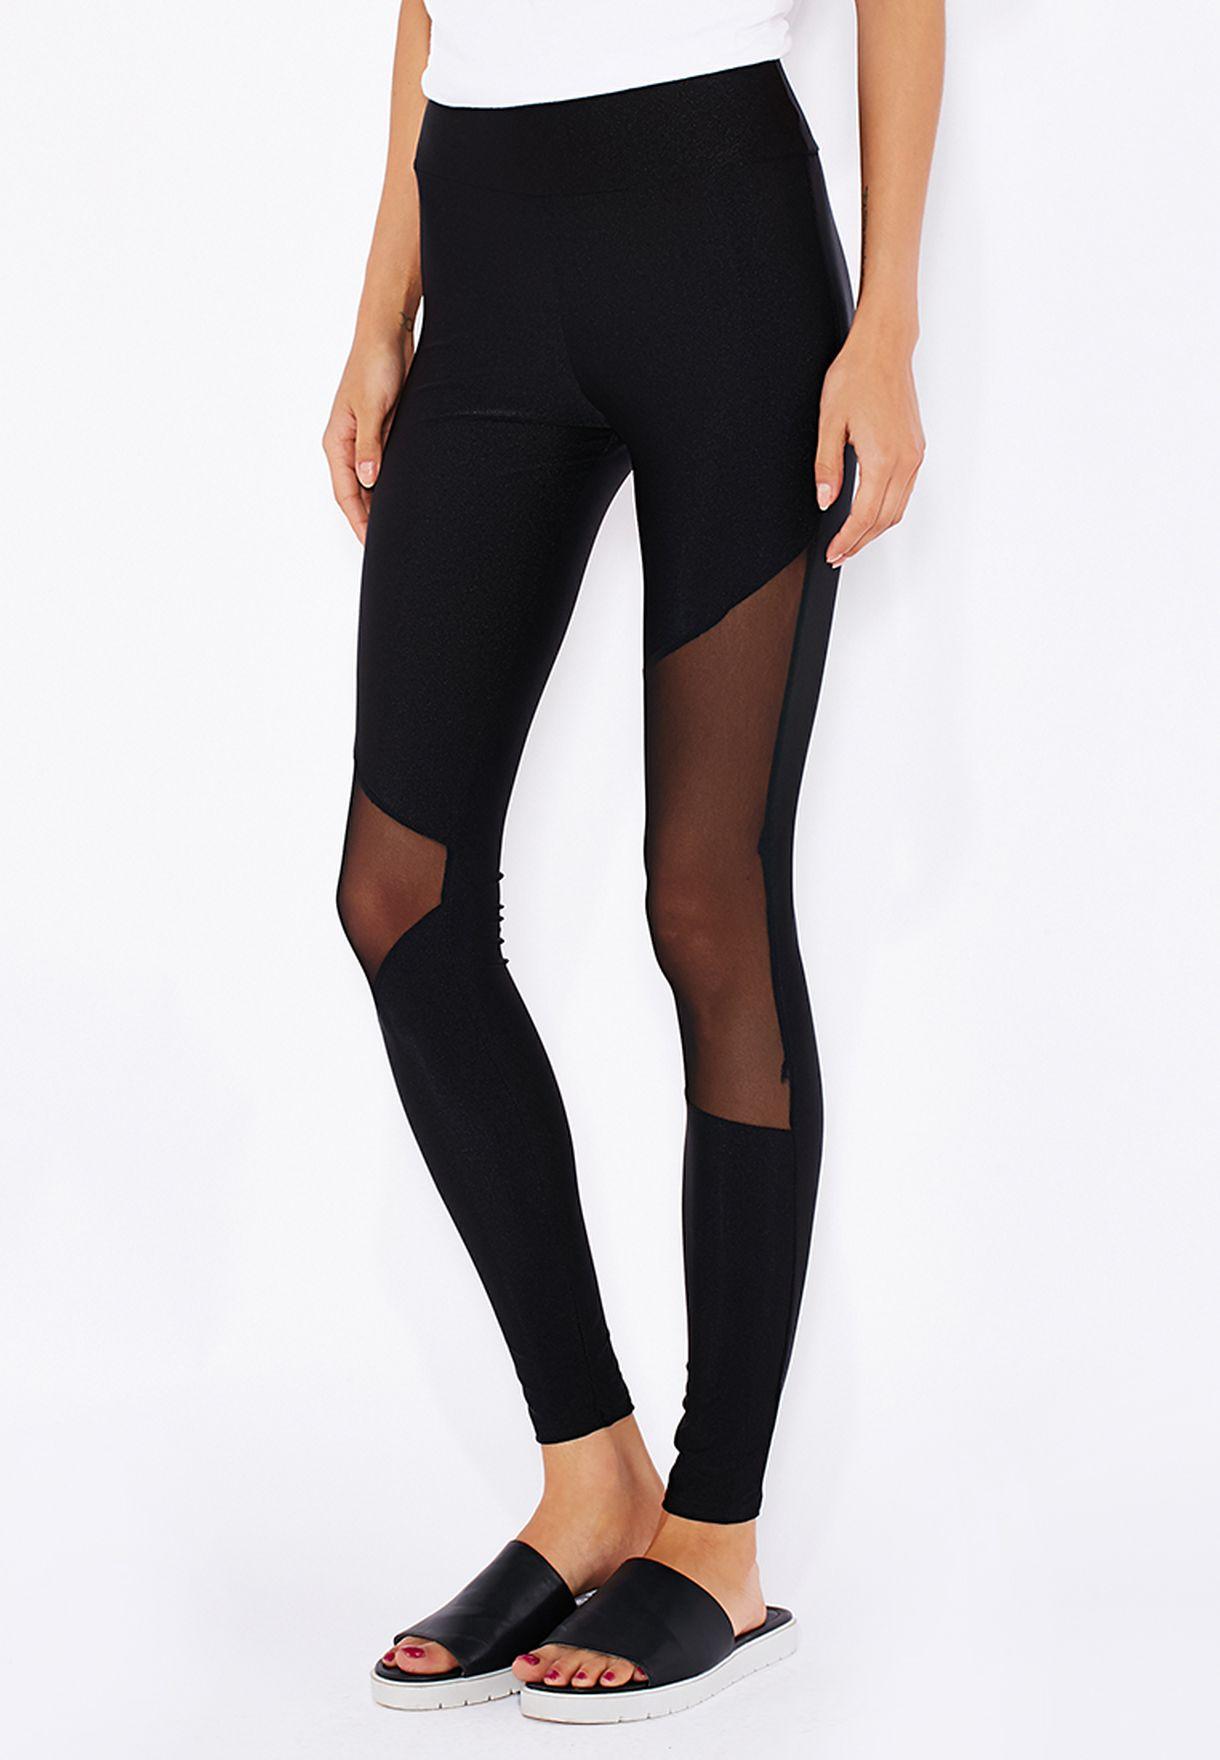 f1abfb2acda55b Shop Boohoo black Mesh Insert Leggings AZZ09832 for Women in Bahrain ...